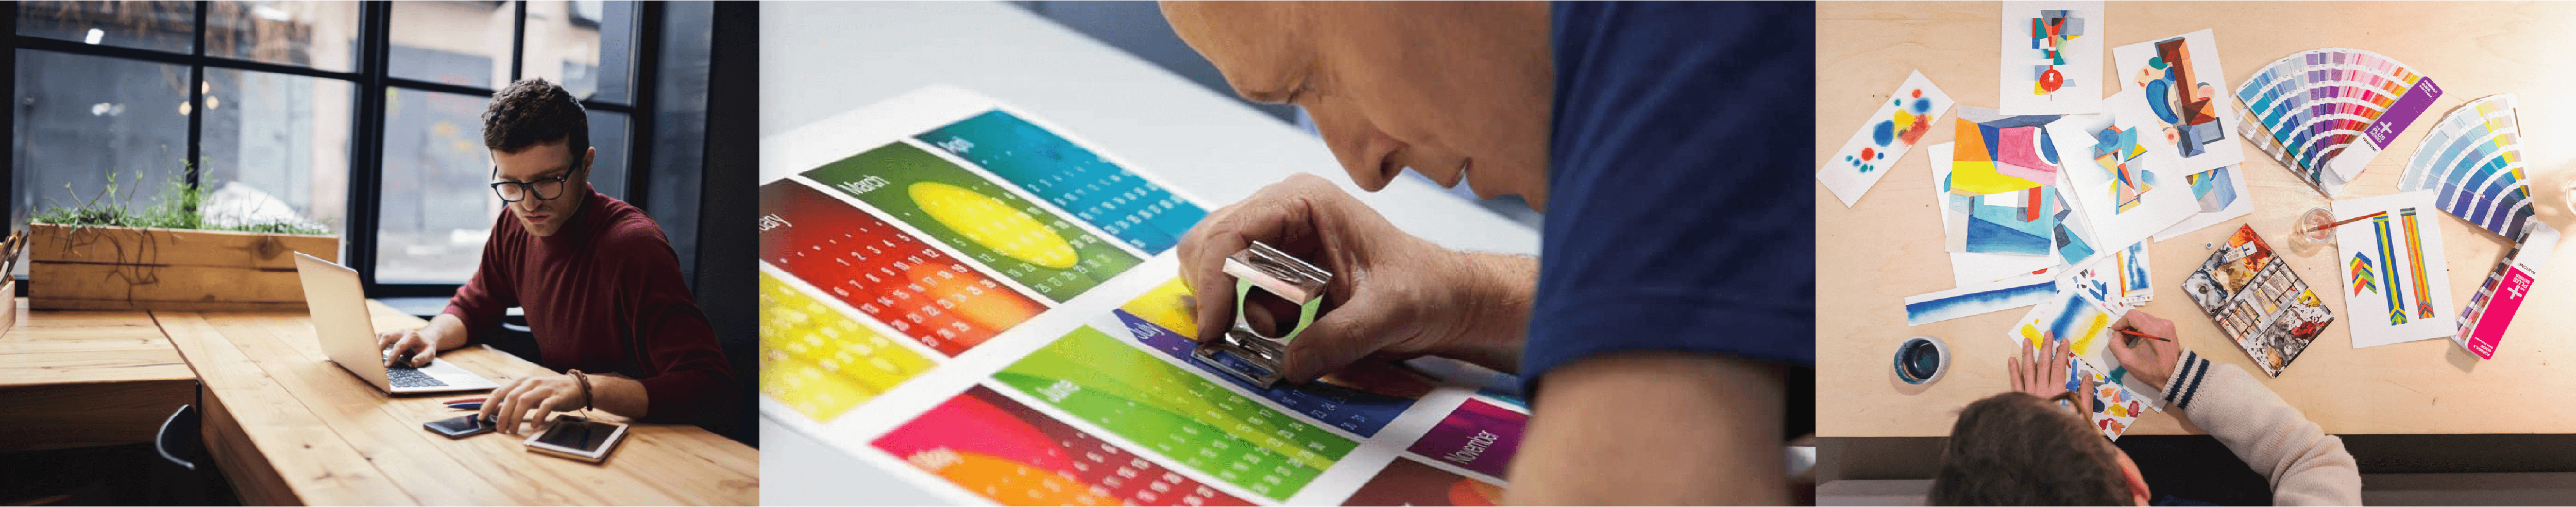 graphiste freelance imprimeur